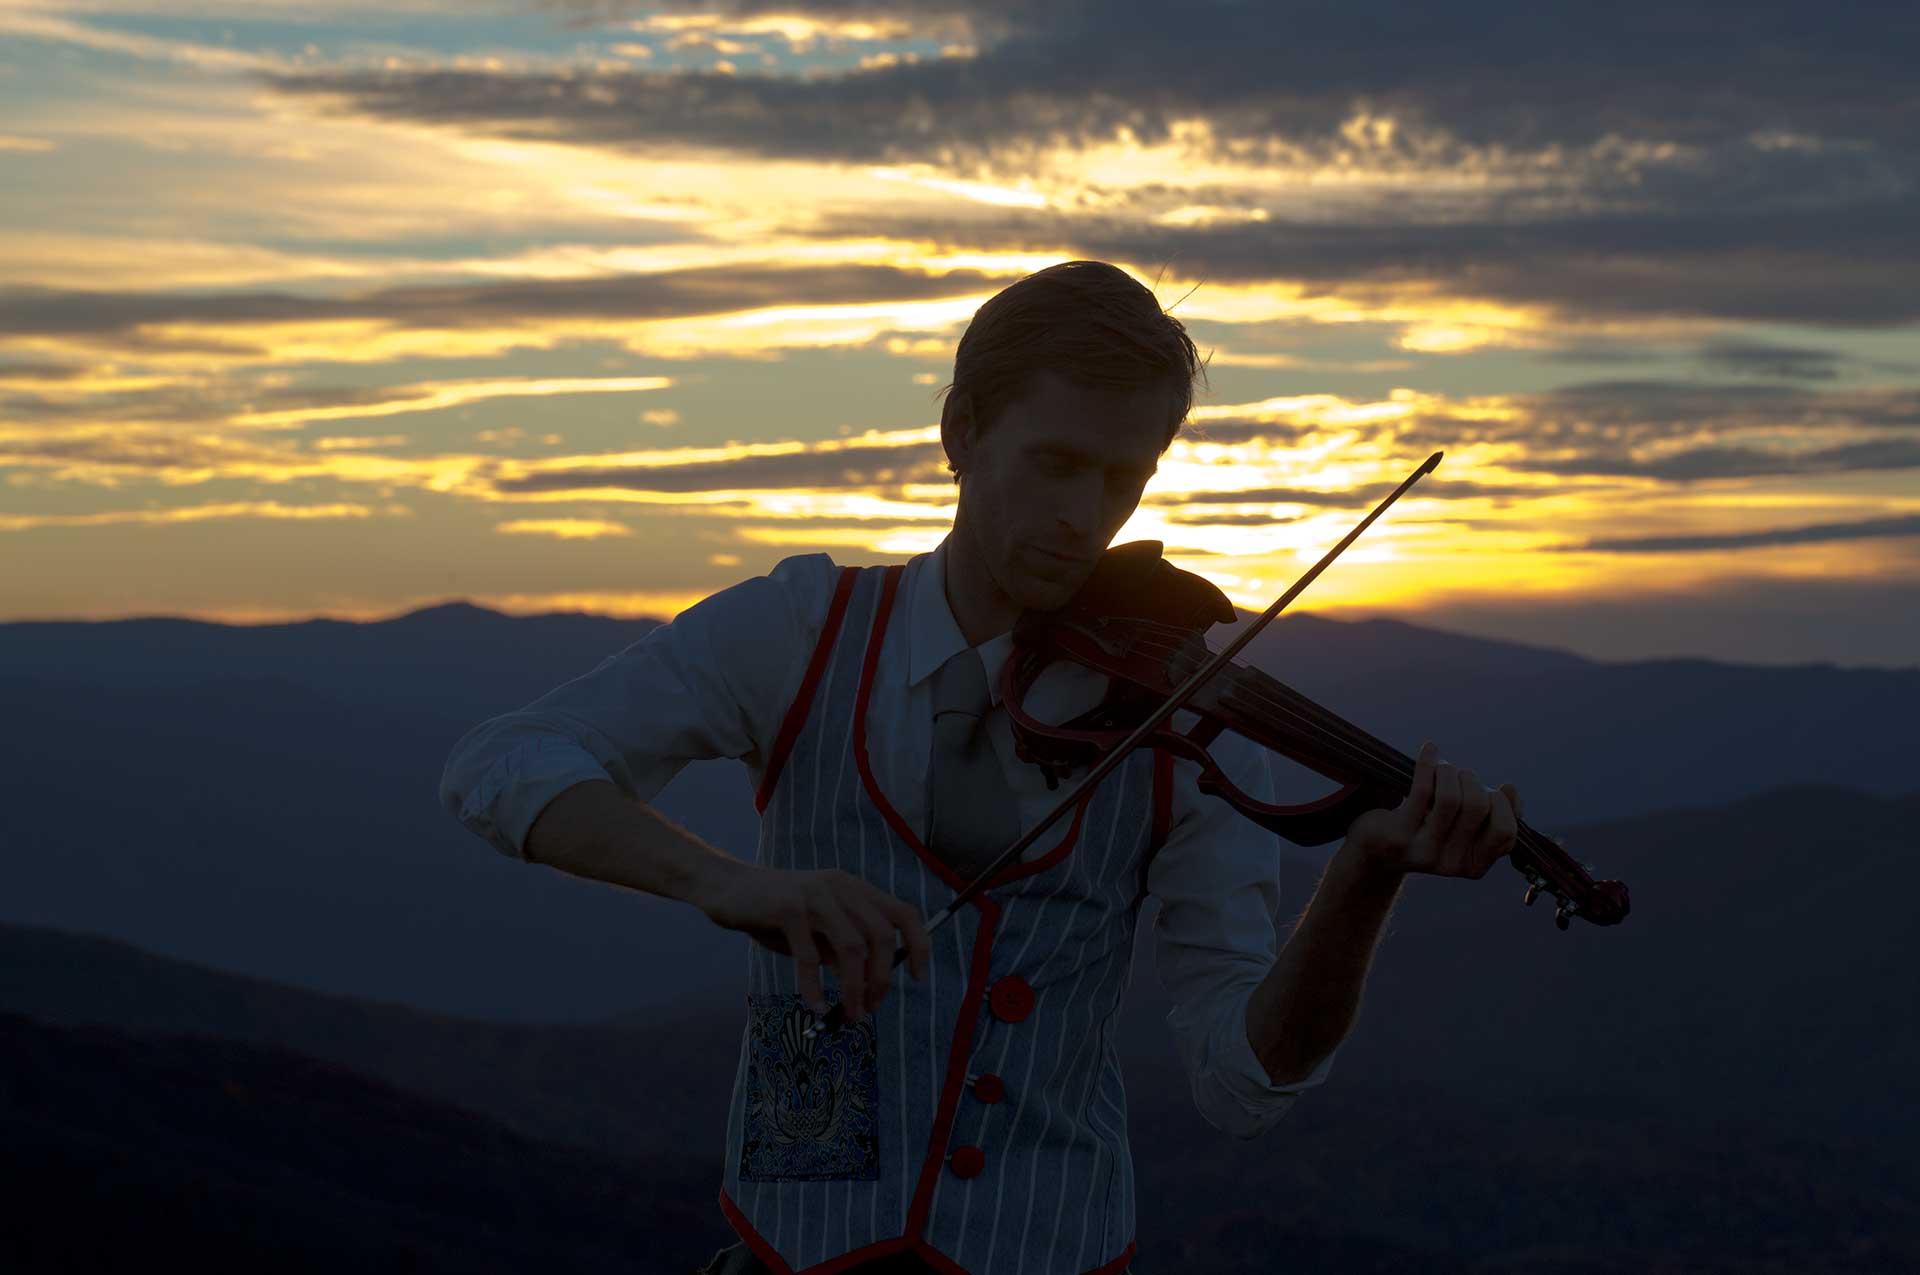 Sunset Violinist